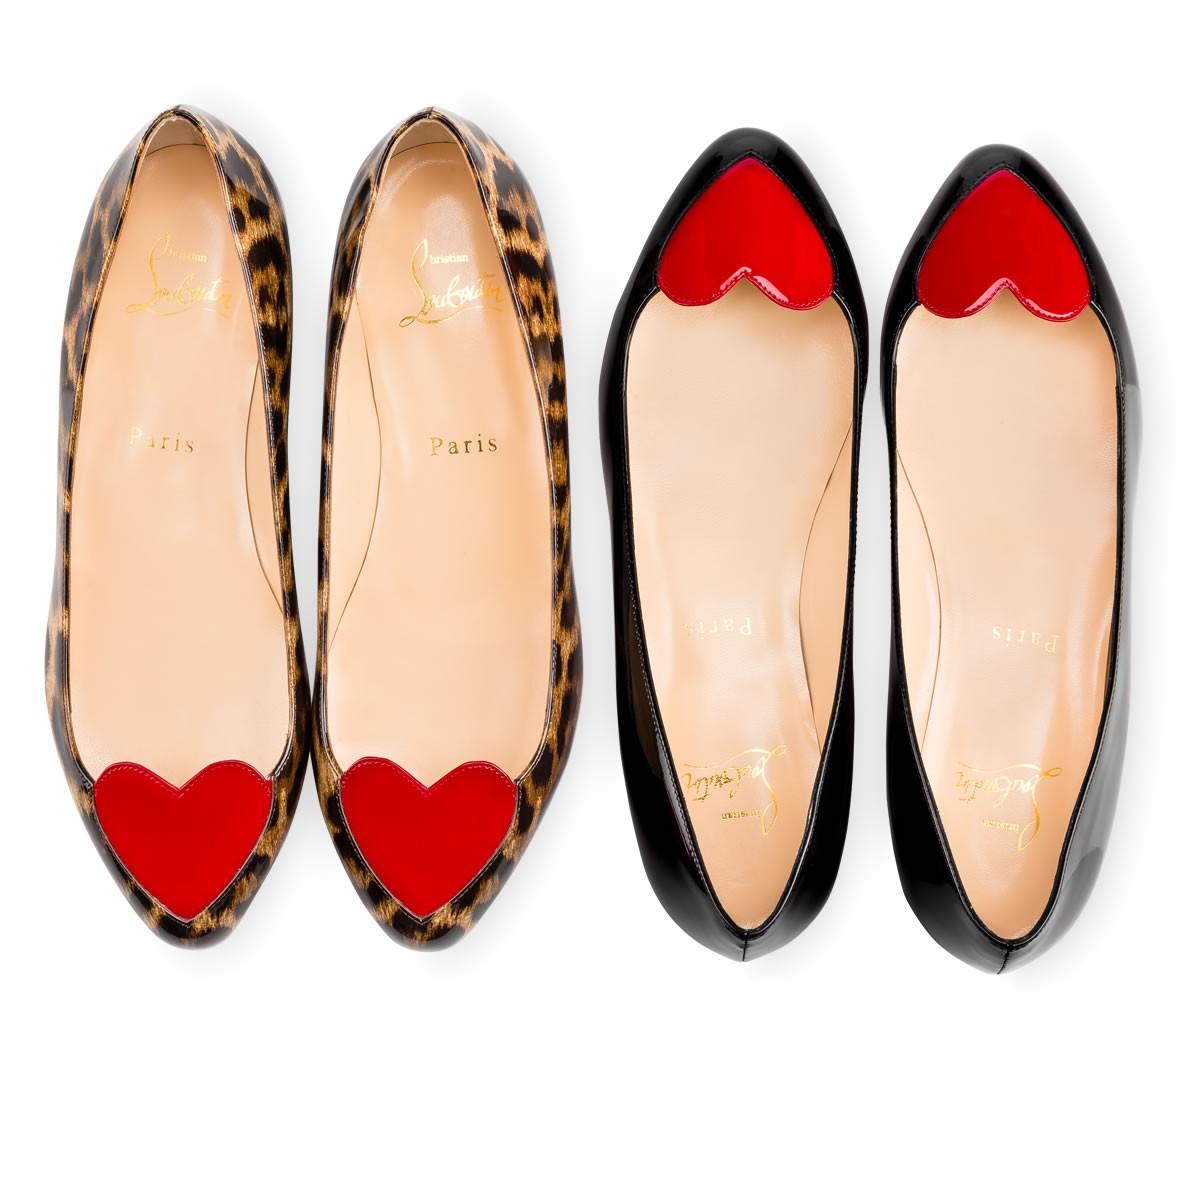 cheap louis vuitton mens shoes - Christian louboutin Doracora Flat in Animal | Lyst